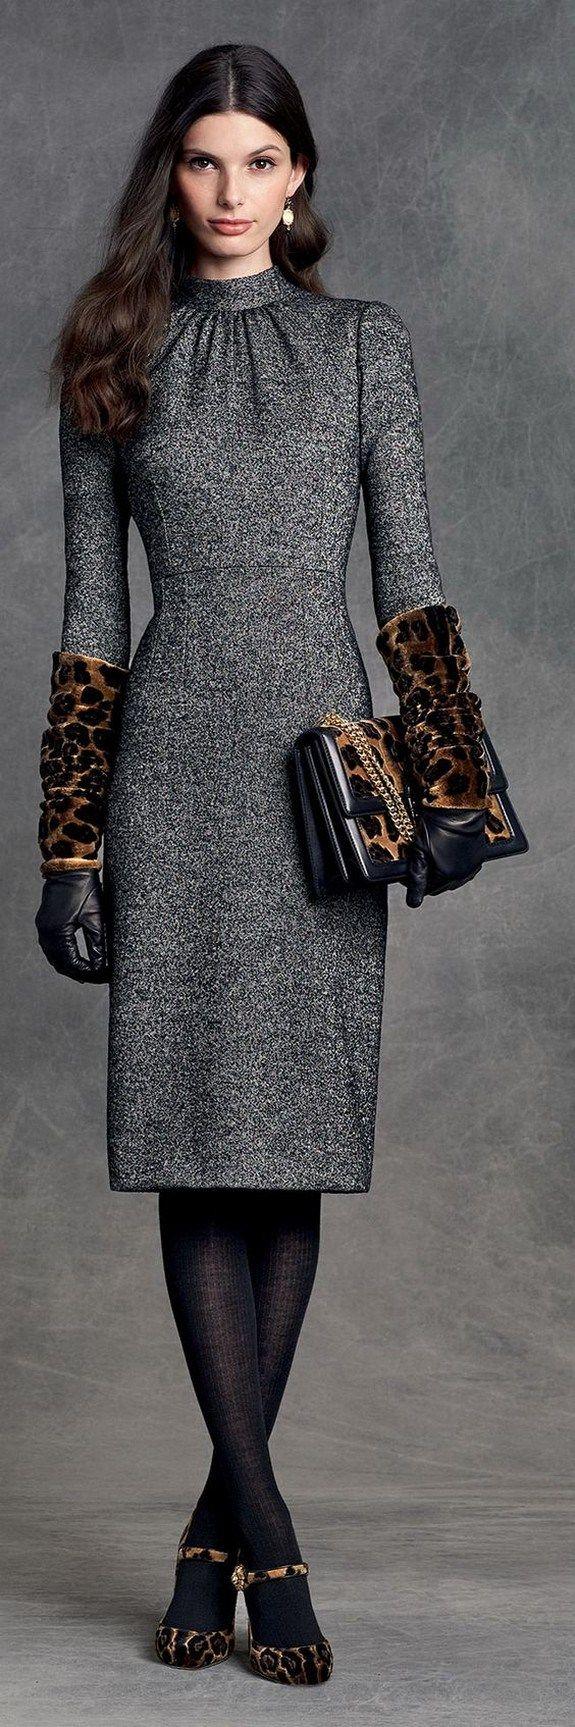 2018 Fashion Winter Dress